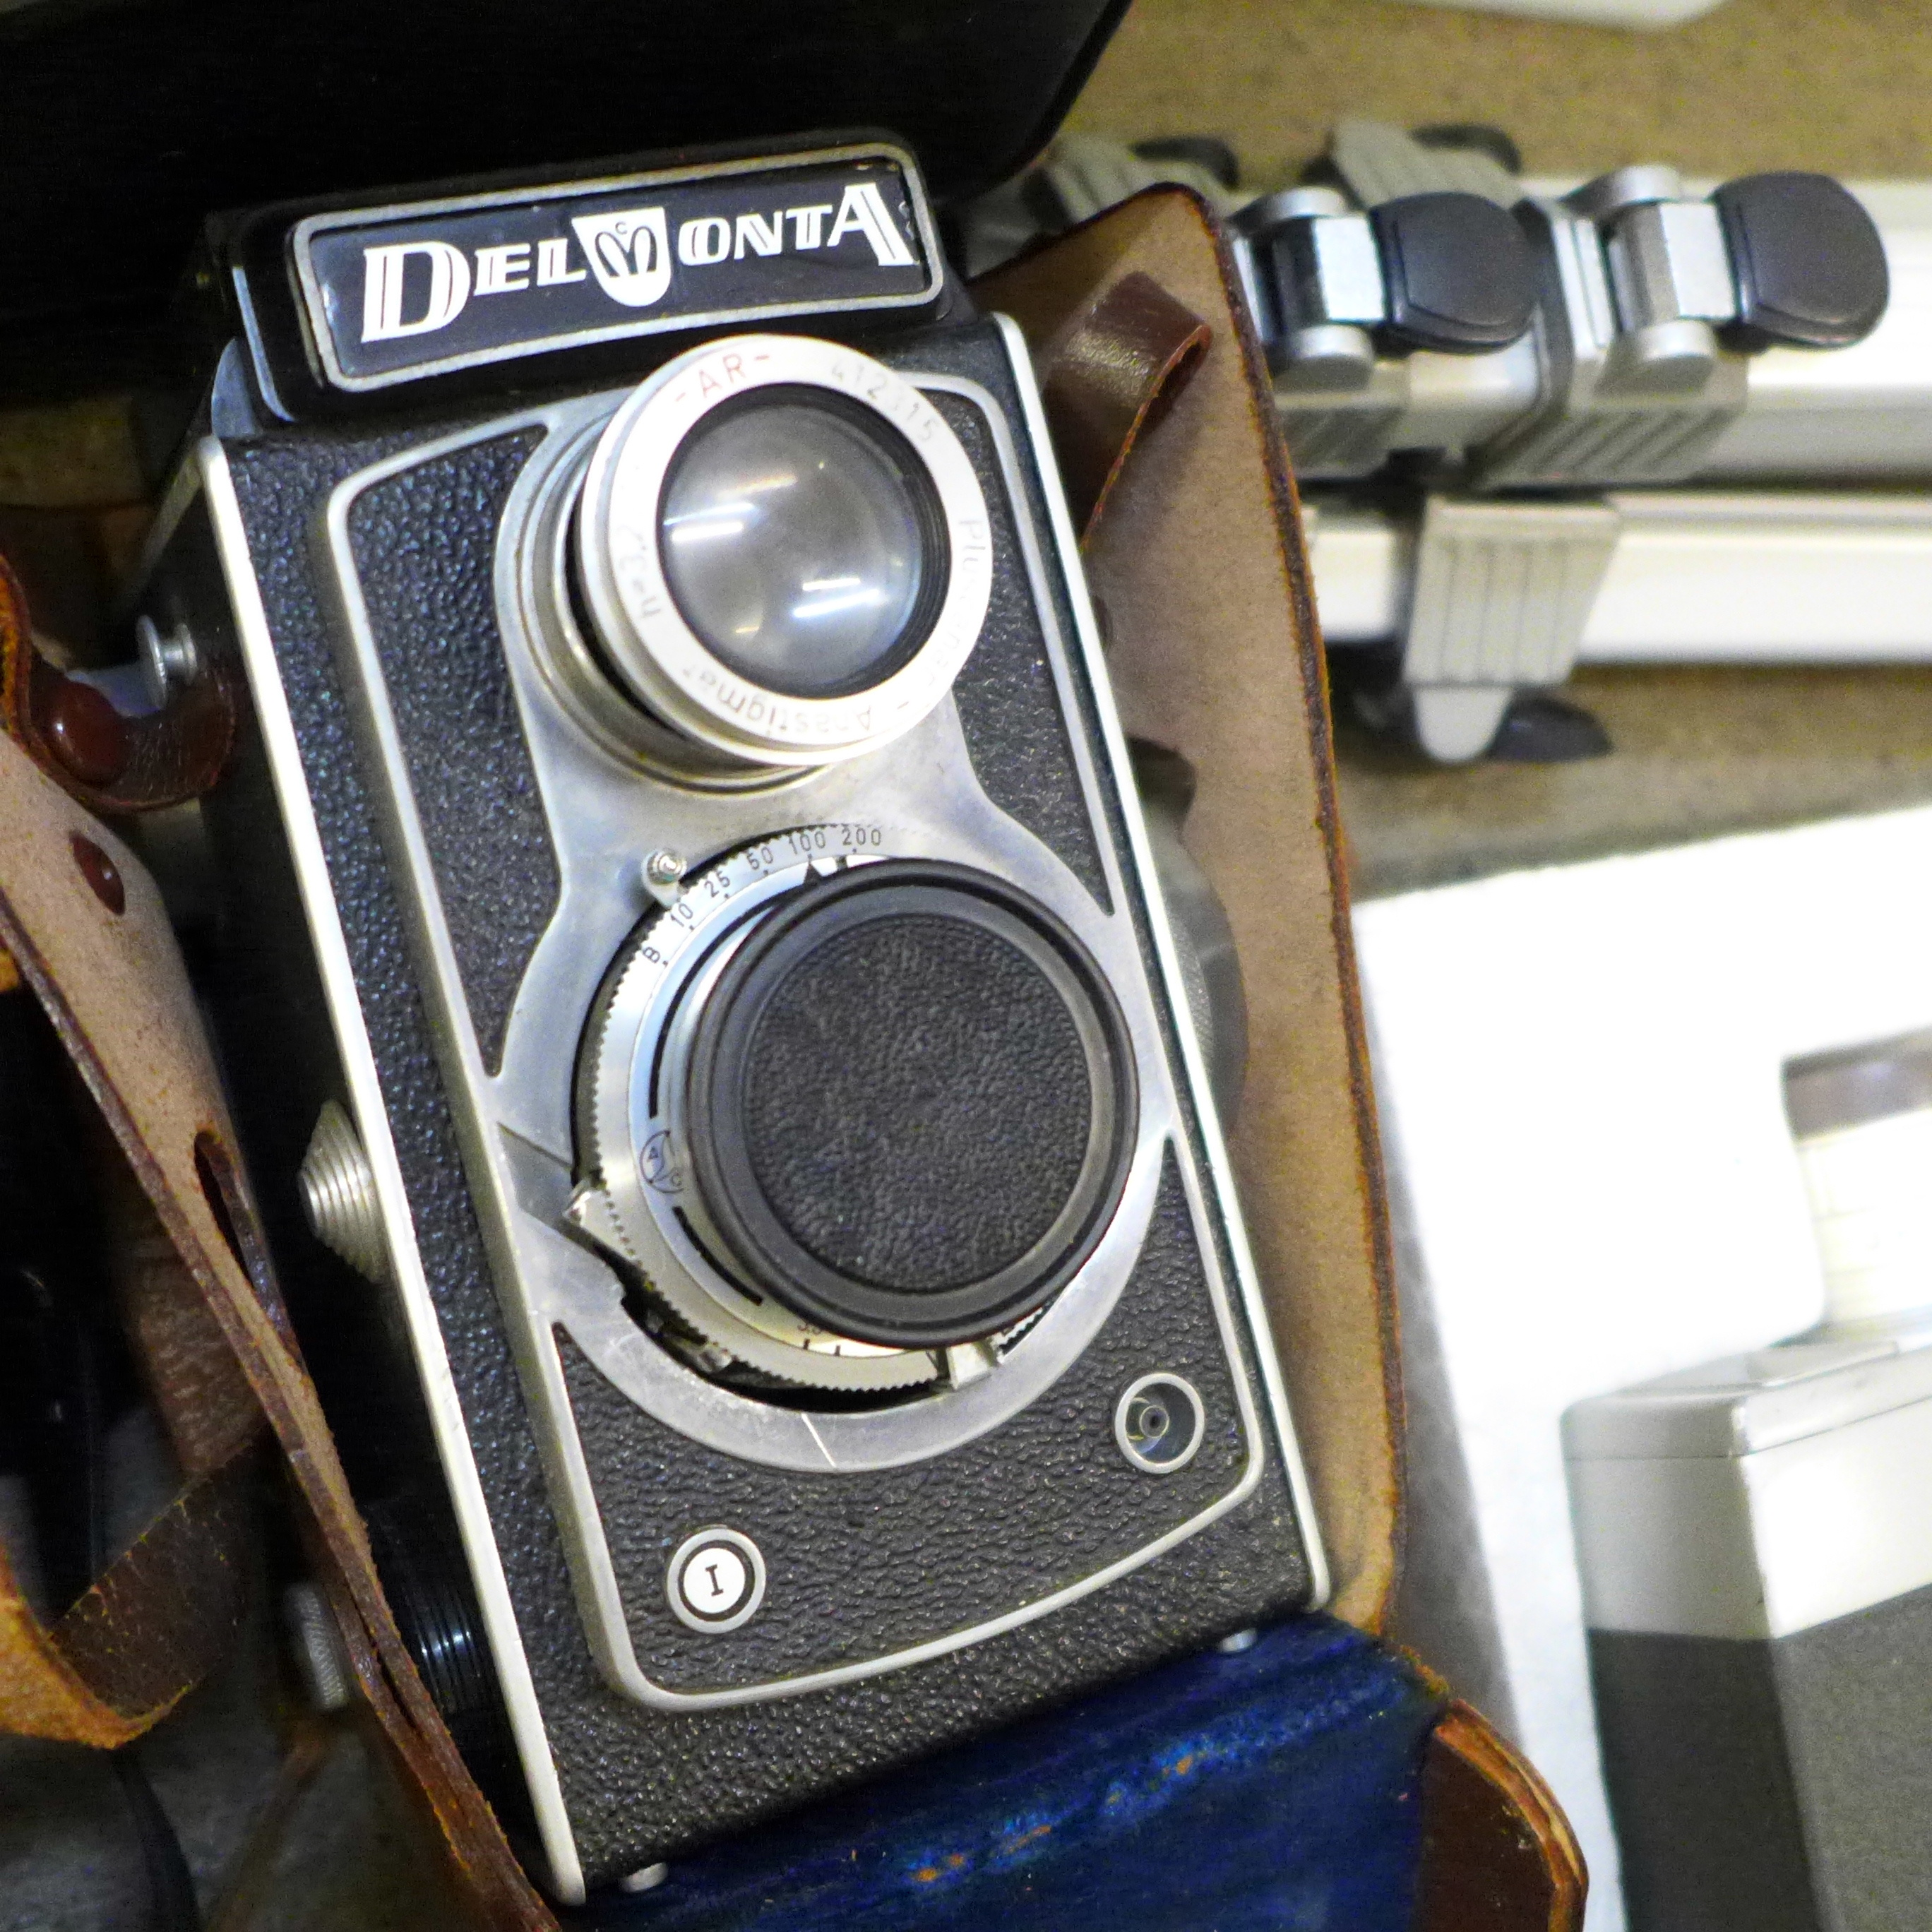 Five cameras; Yashica Mat-124 G, Nikon EM, Del Monza, Kodak Brownie, Zenit-E, a Jello cine camera, - Image 4 of 6